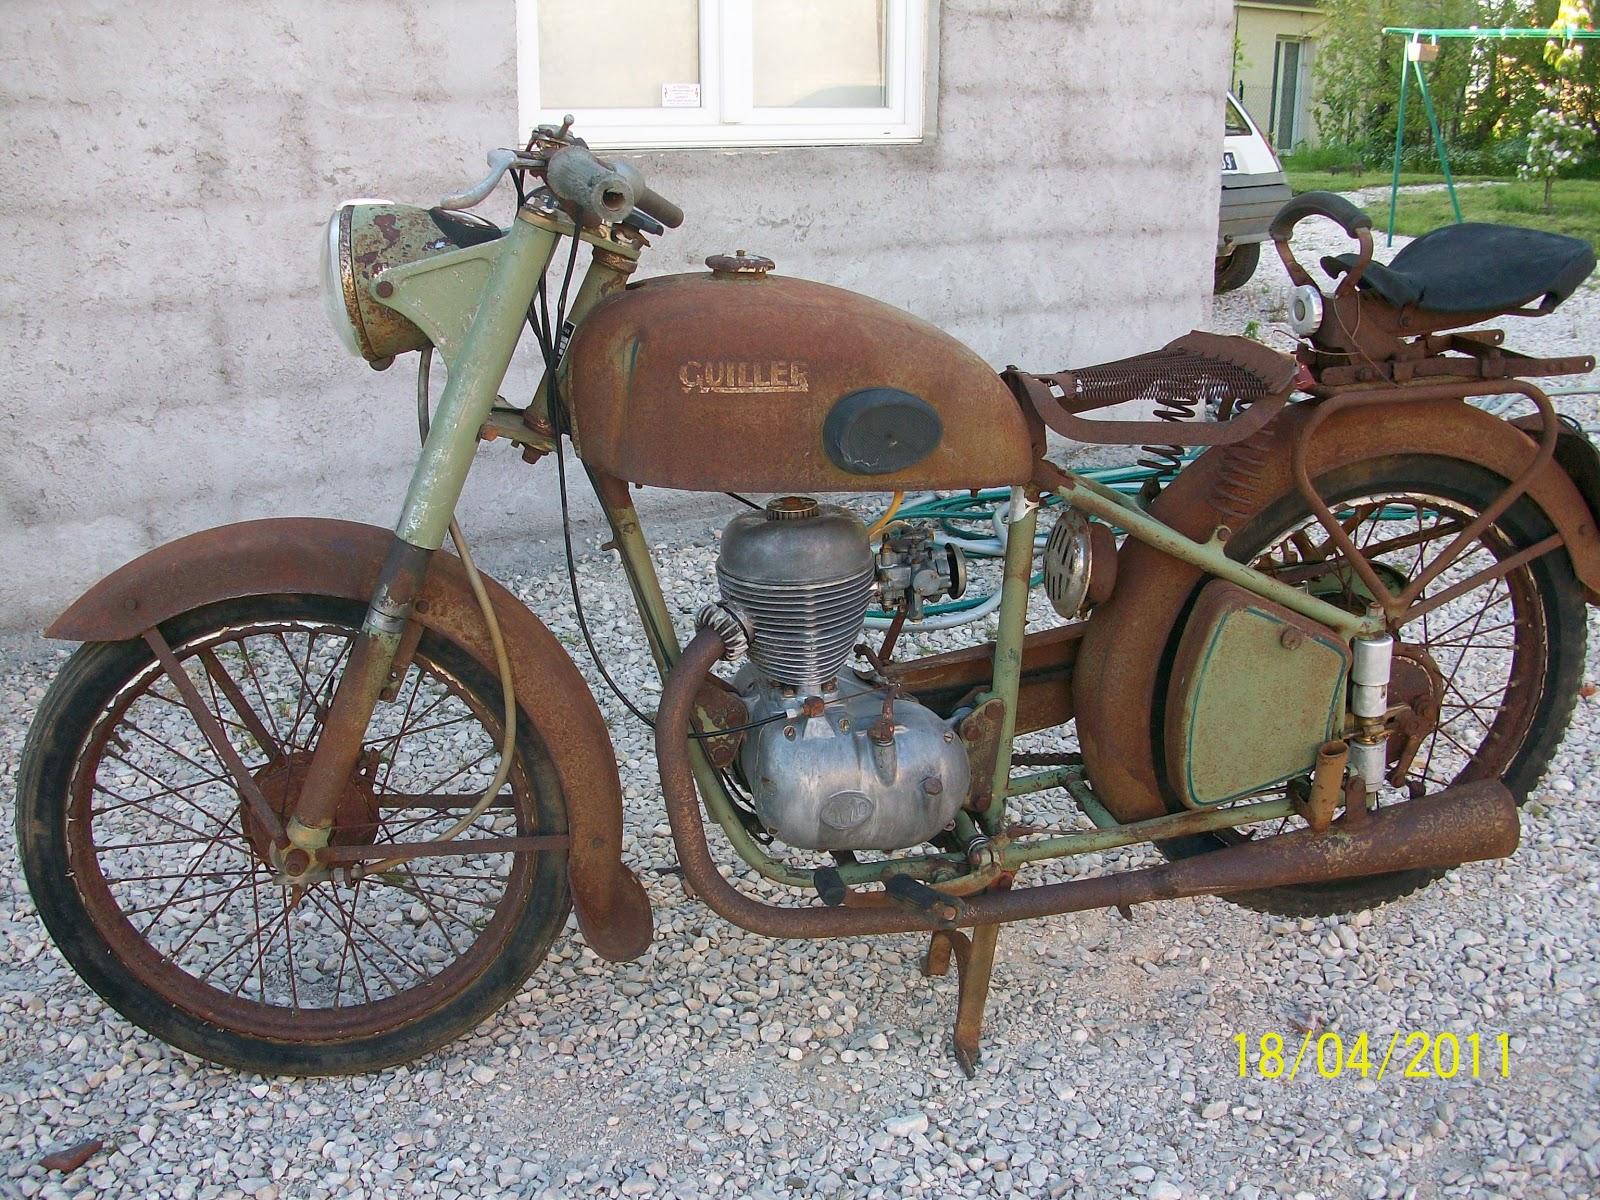 guillier 125 g87 de 1954 mes motos anciennes. Black Bedroom Furniture Sets. Home Design Ideas